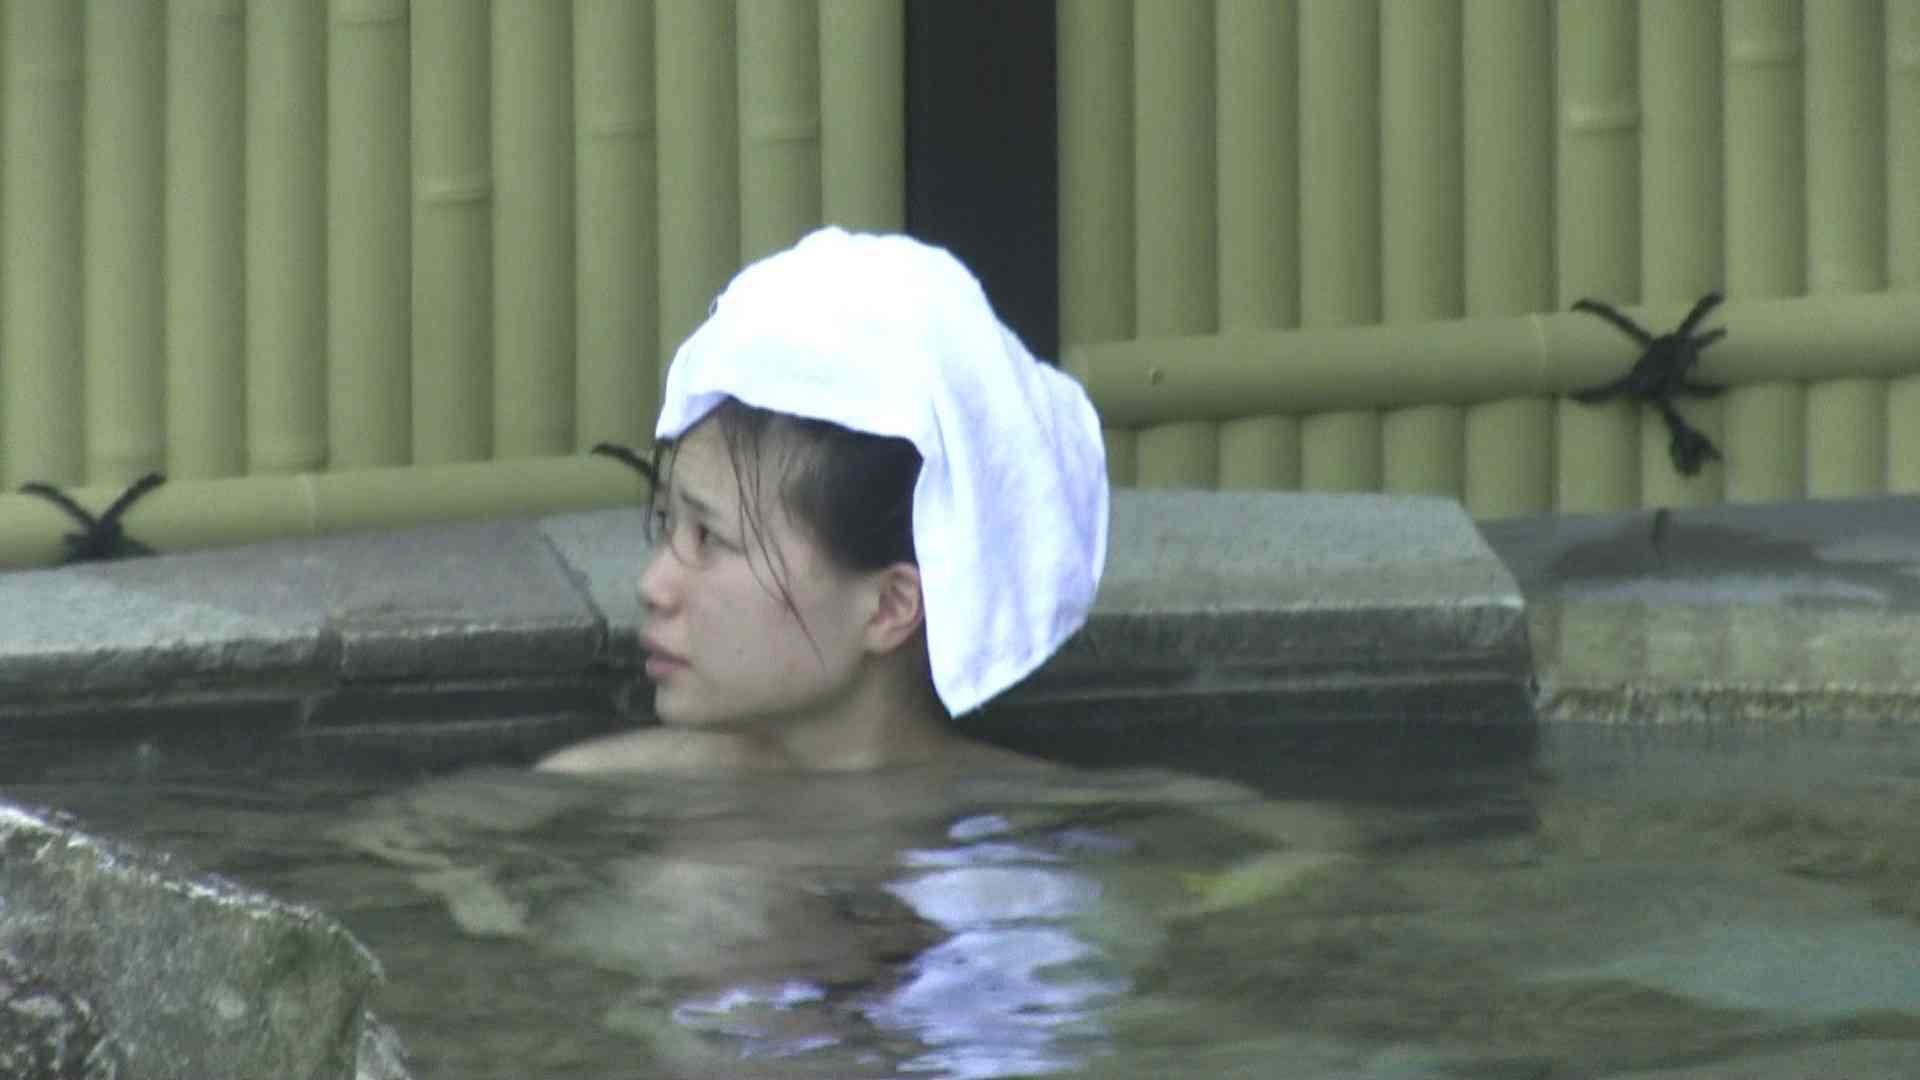 Aquaな露天風呂Vol.183 盗撮師作品 エロ無料画像 105pic 62